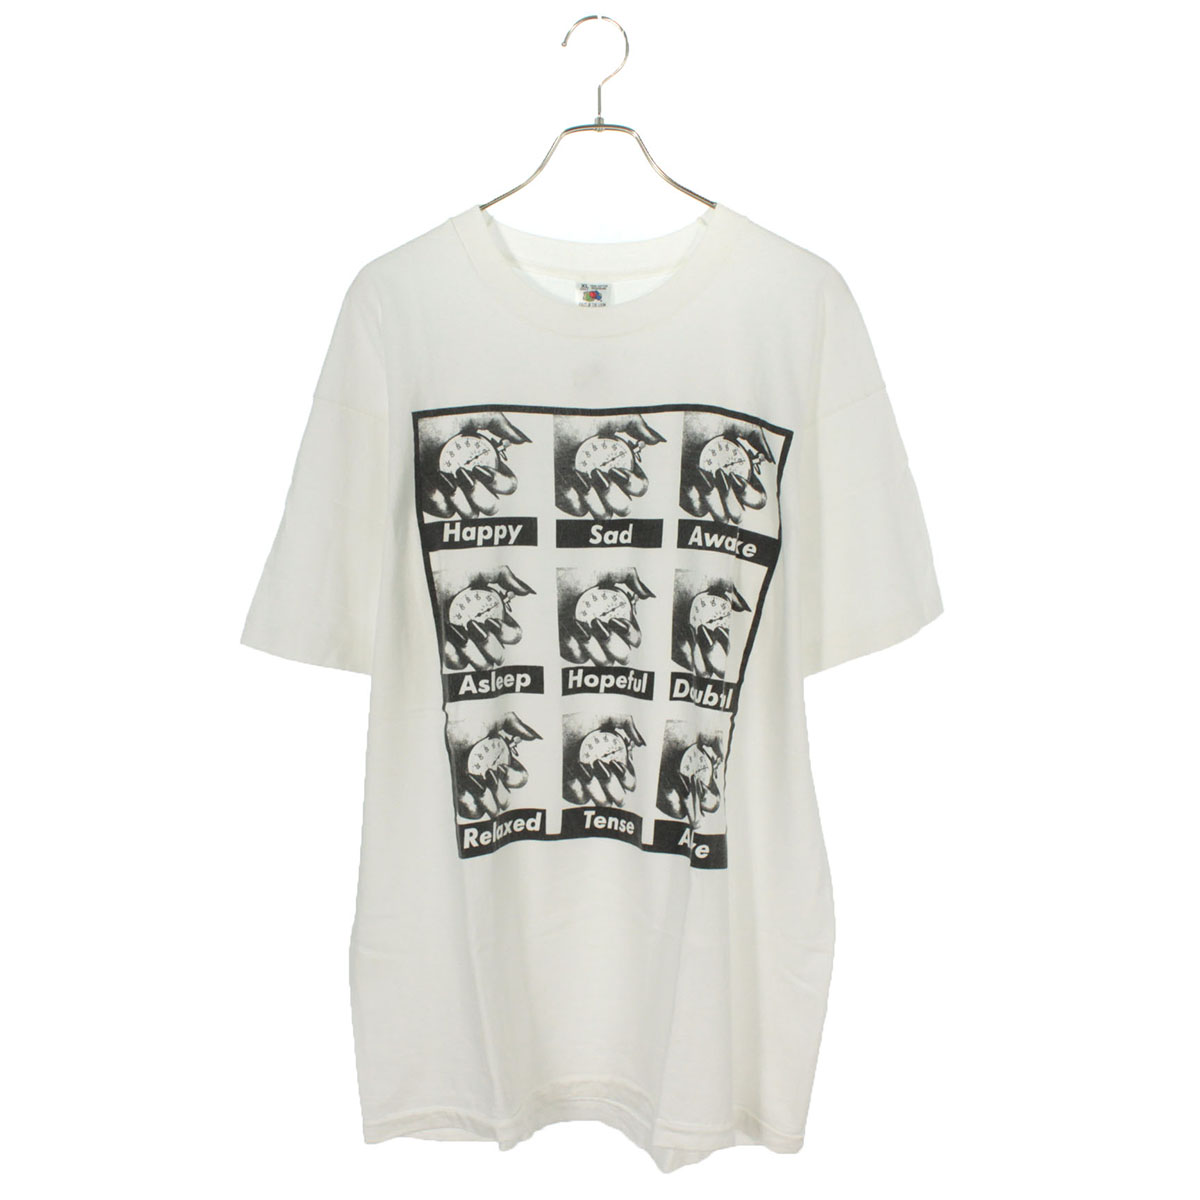 90s バーバラクルーガー エイズチャリティー Tシャツ